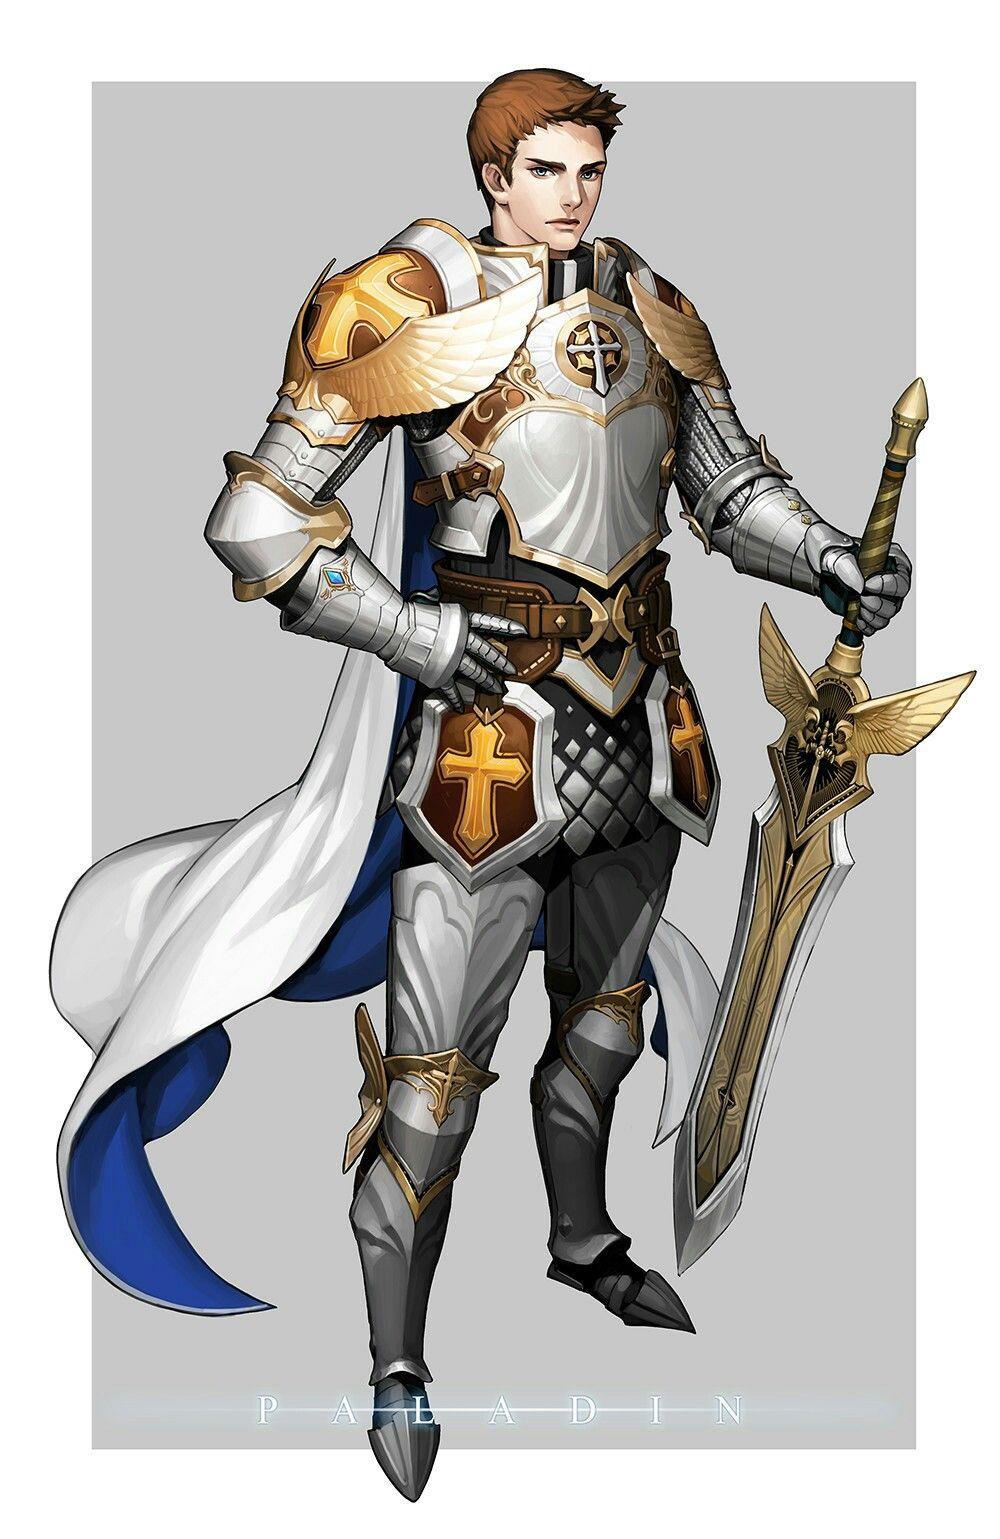 Human Paladin - Pathfinder PFRPG DND D&D d20 fantasy   Paladin, Fantasy heroes, Fantasy warrior